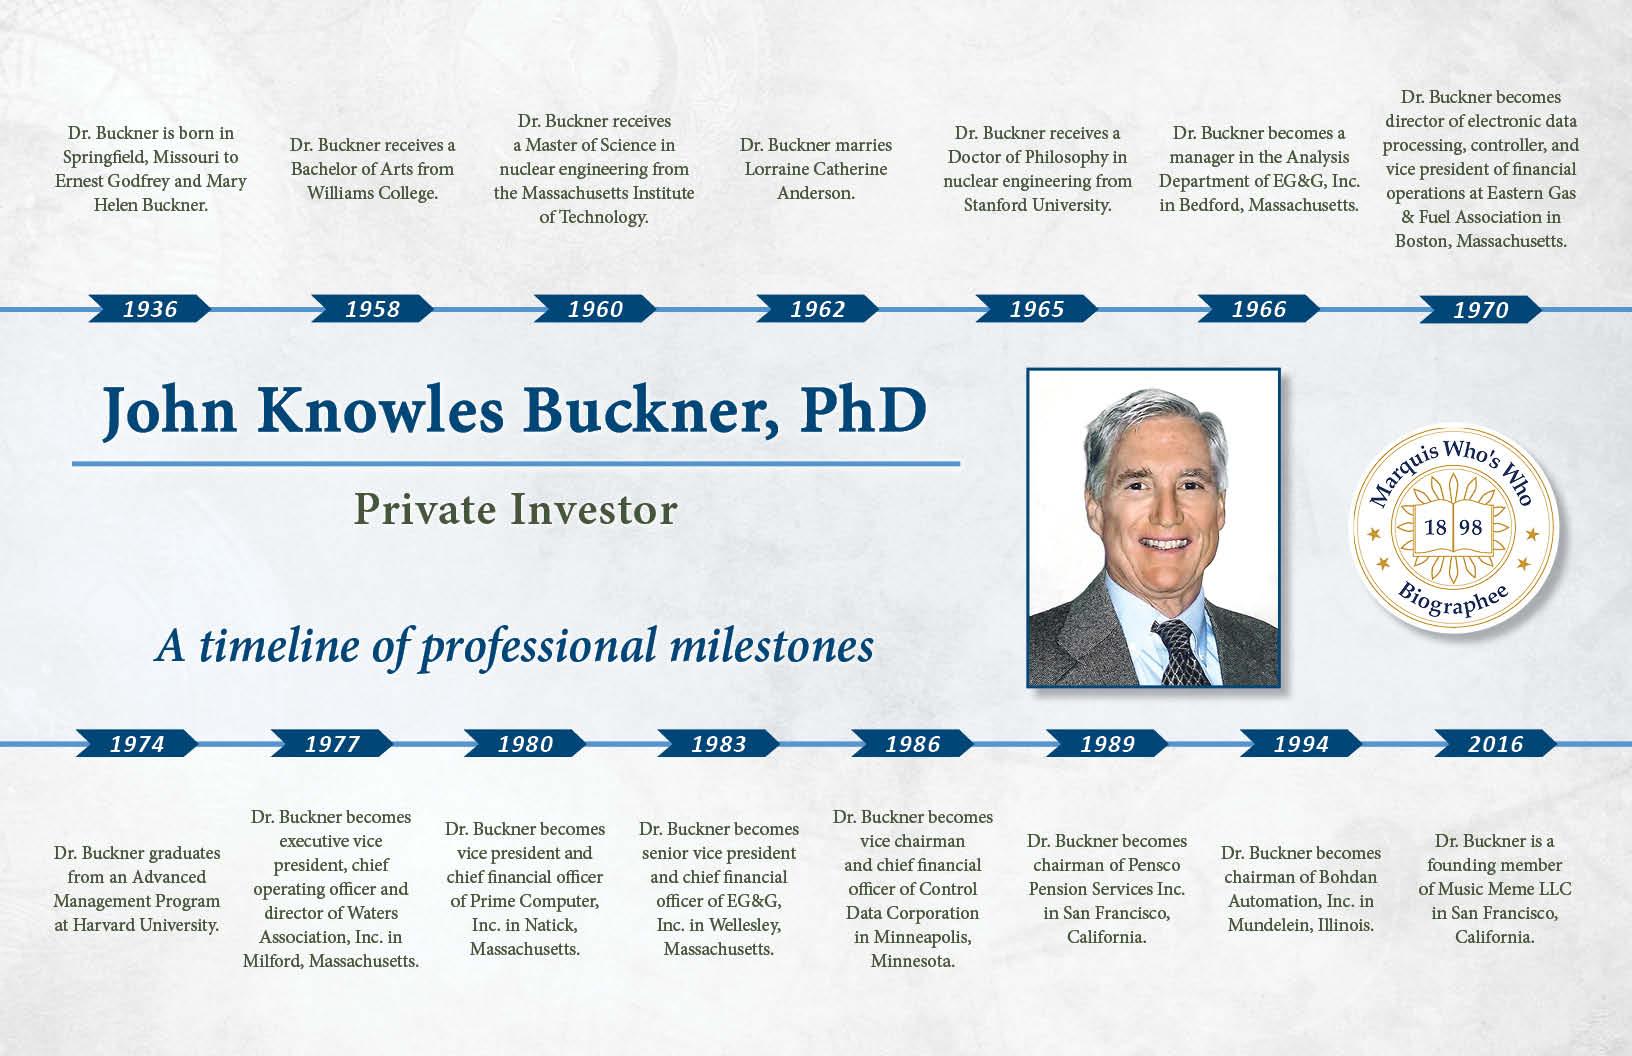 John Buckner Professional Milestones